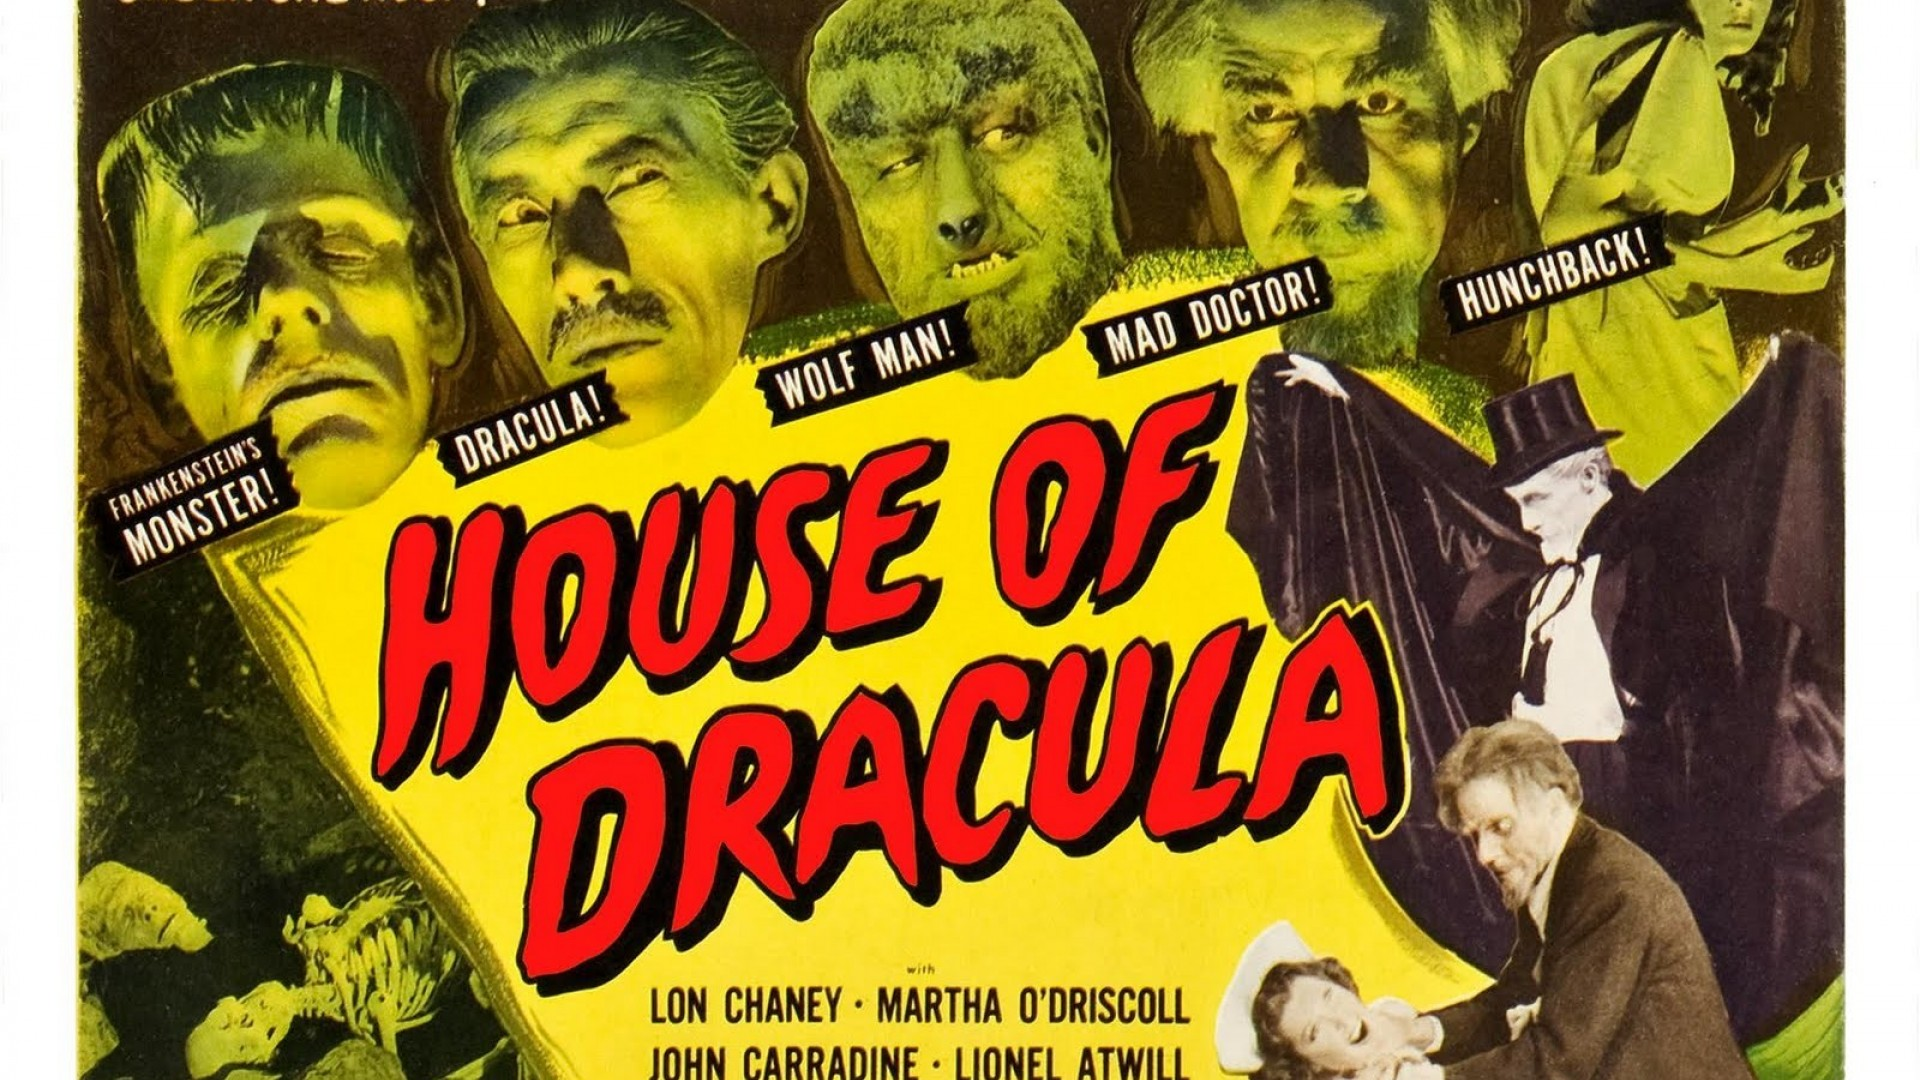 classic horror movie posters wallpaper wwwimgkidcom